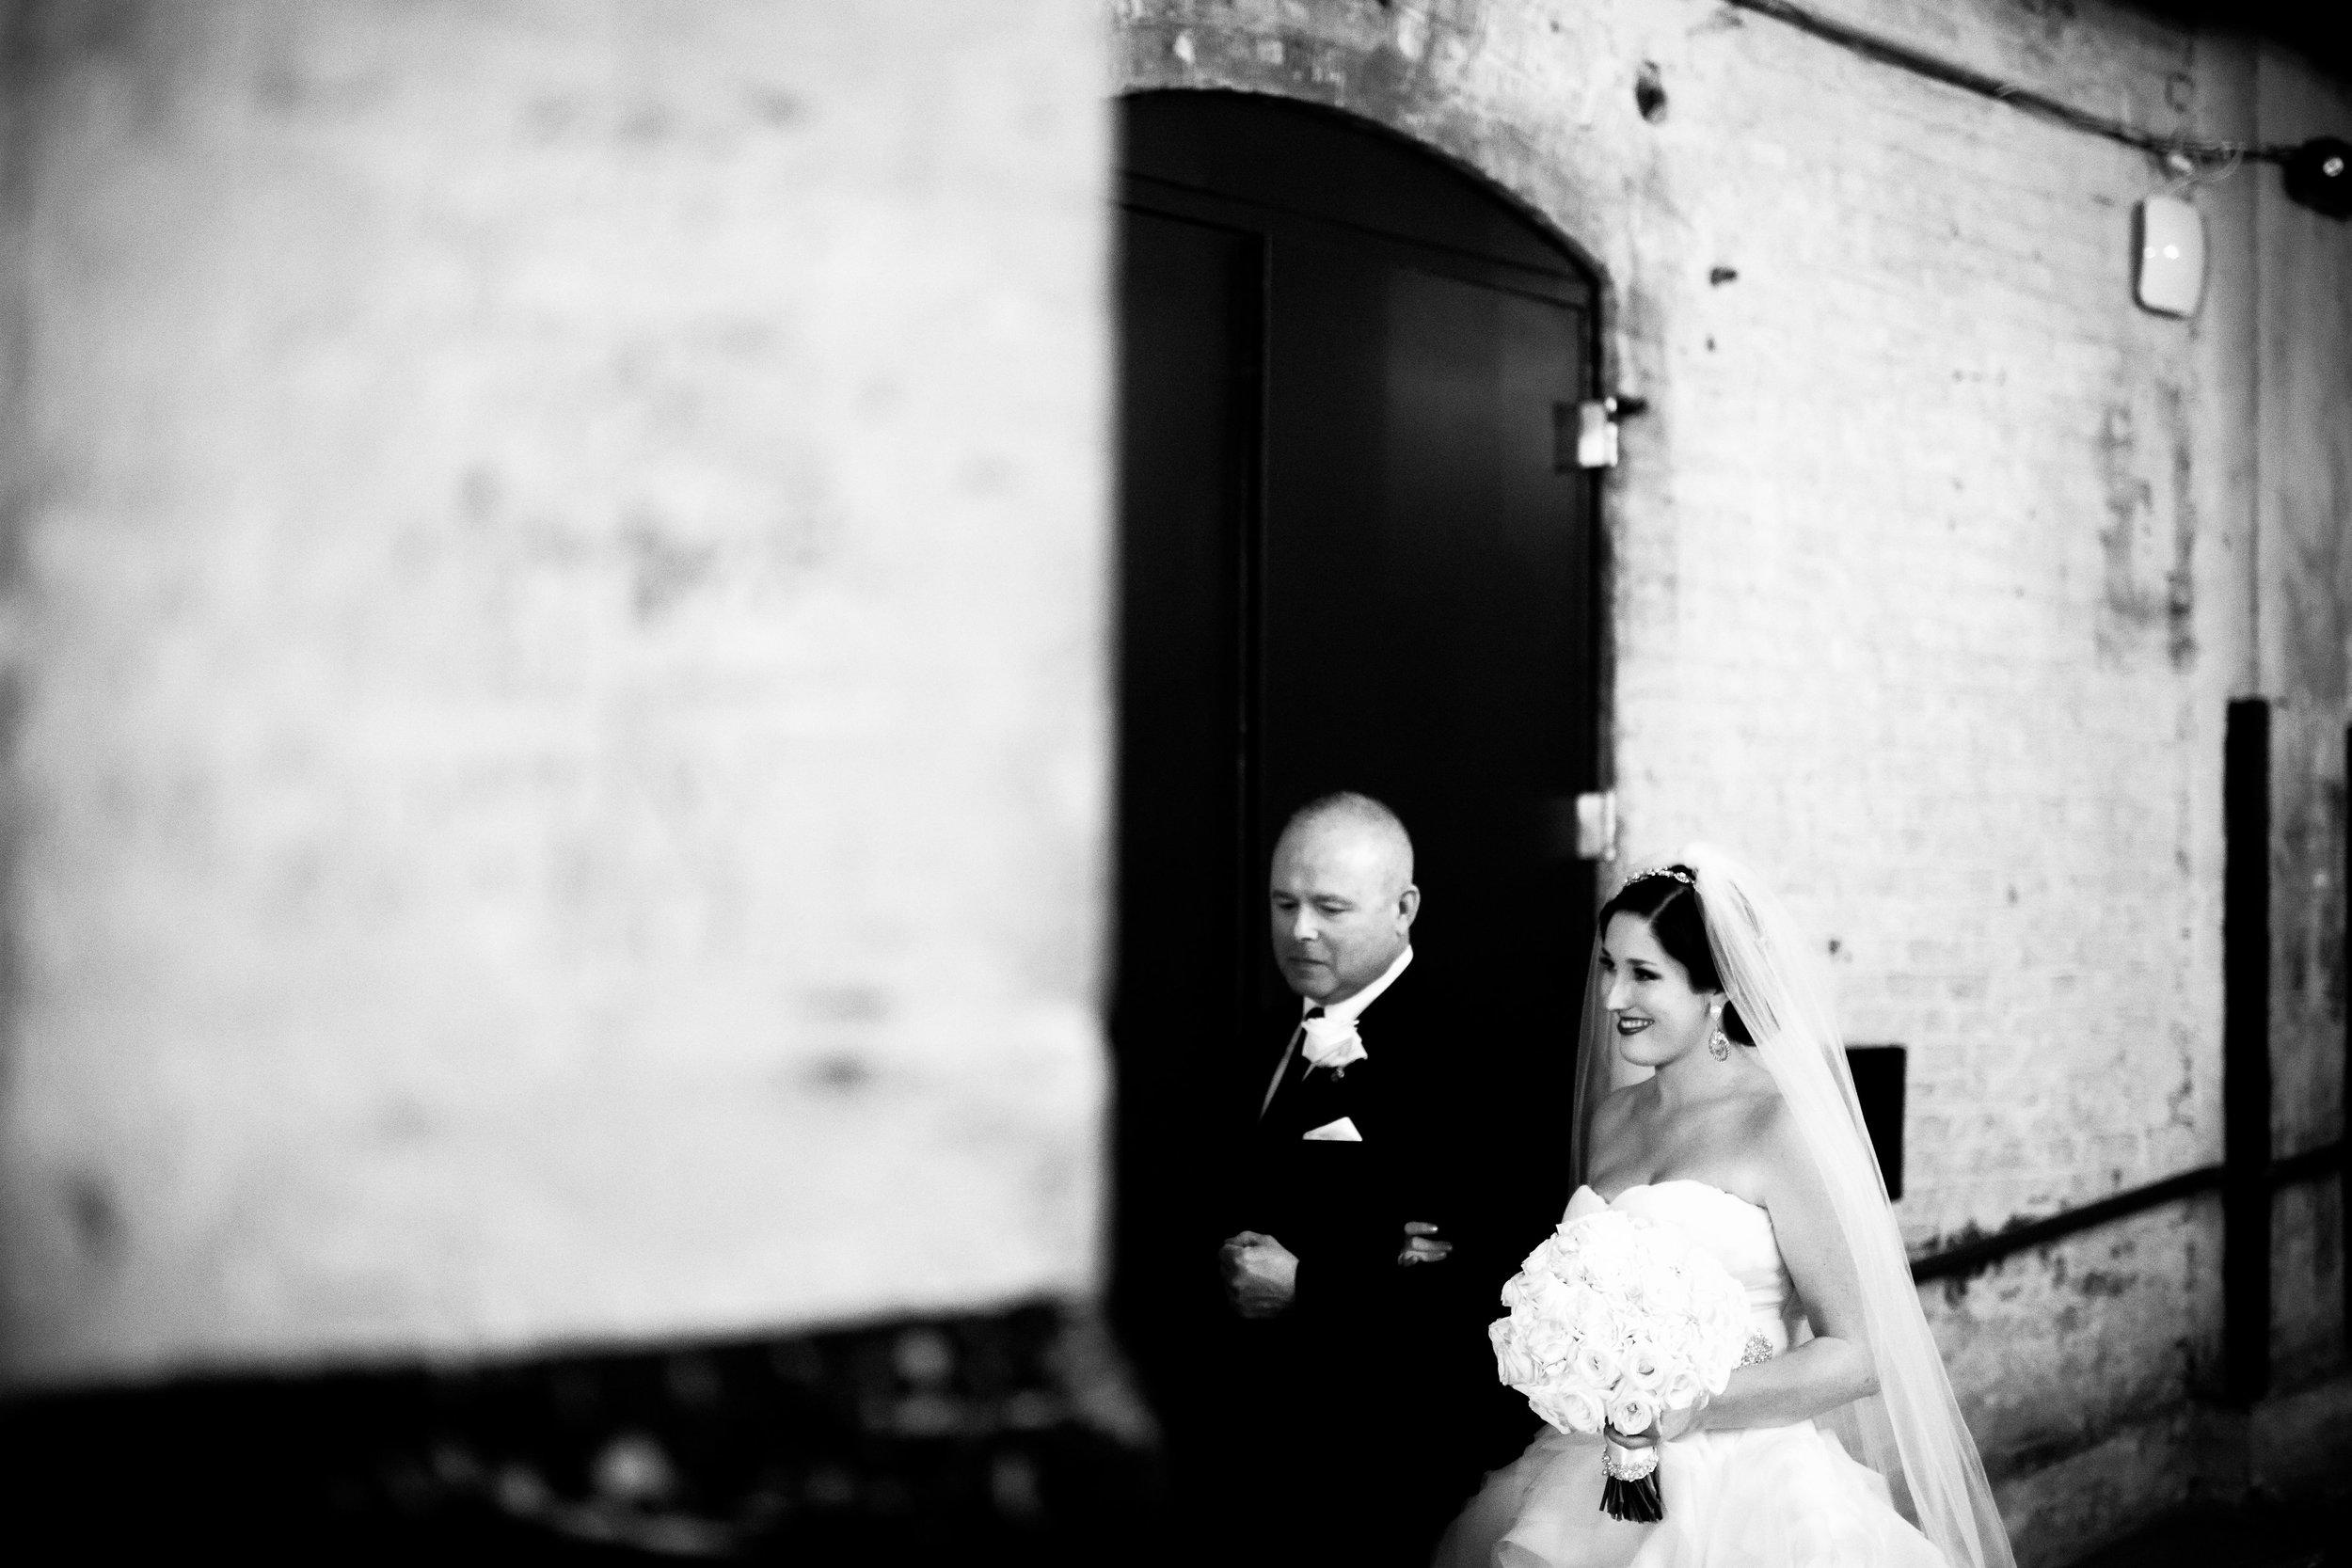 clewellphotography-44219.jpg